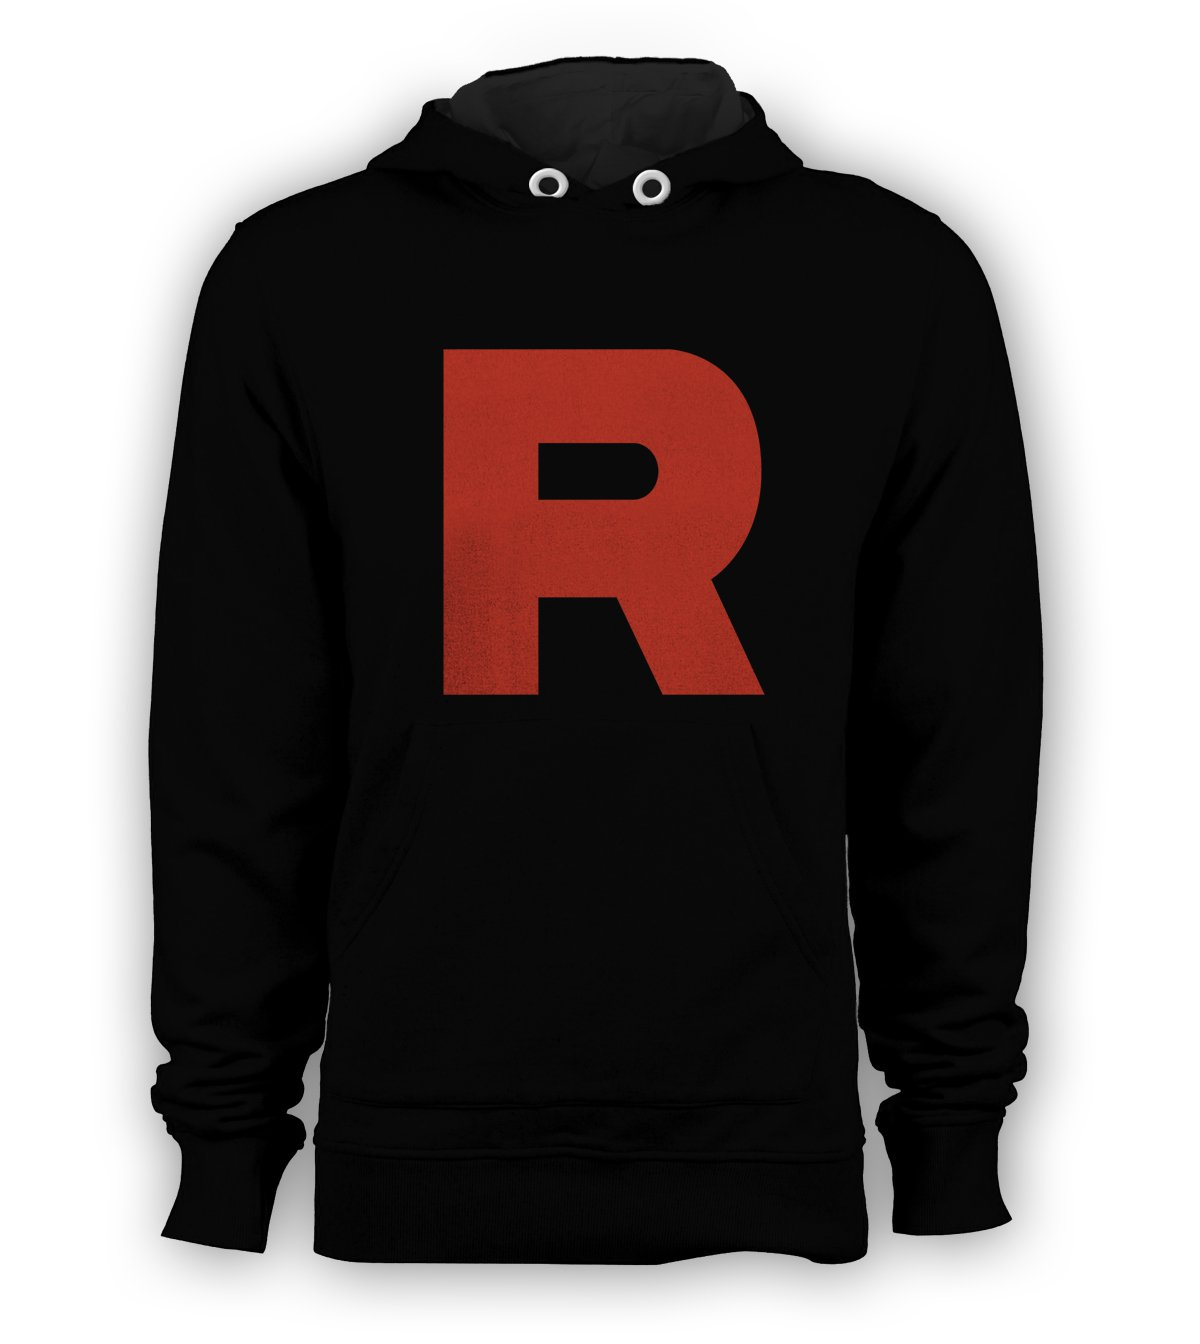 Team Rocket R Symbol Pokemon Pullover Hoodie Men Sweatshirts Size S to 3XL New Black